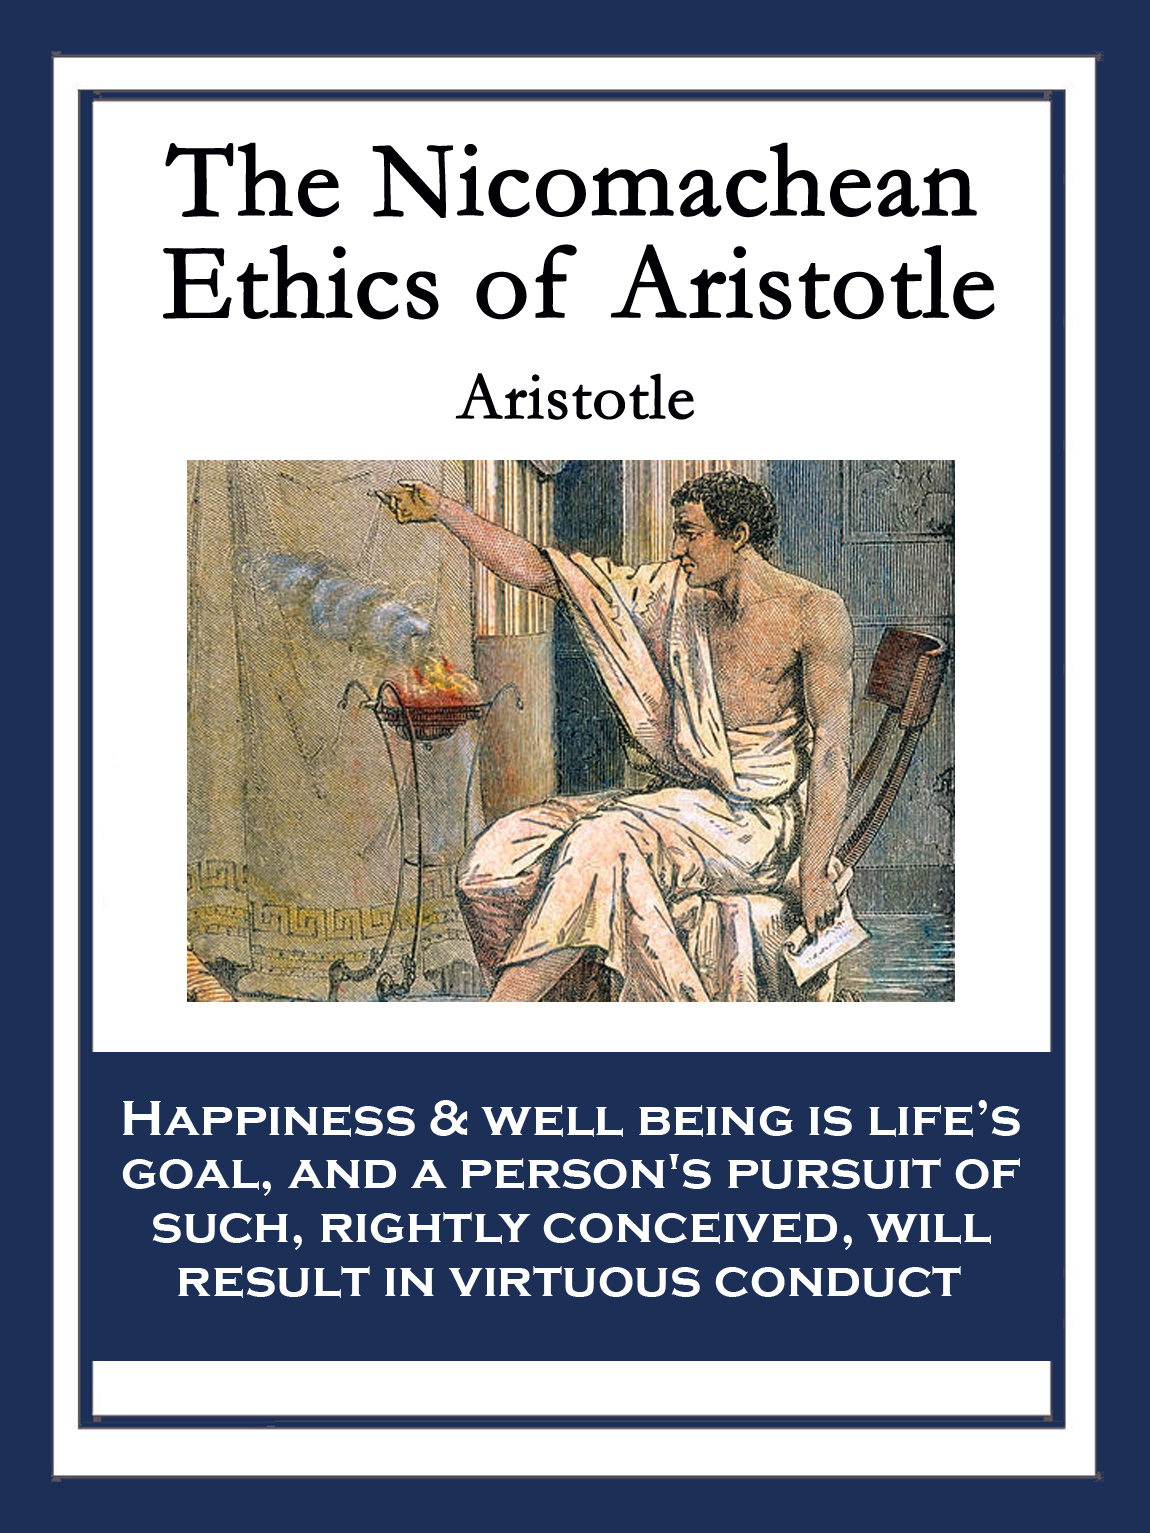 aristotles nicomachean ethics essay